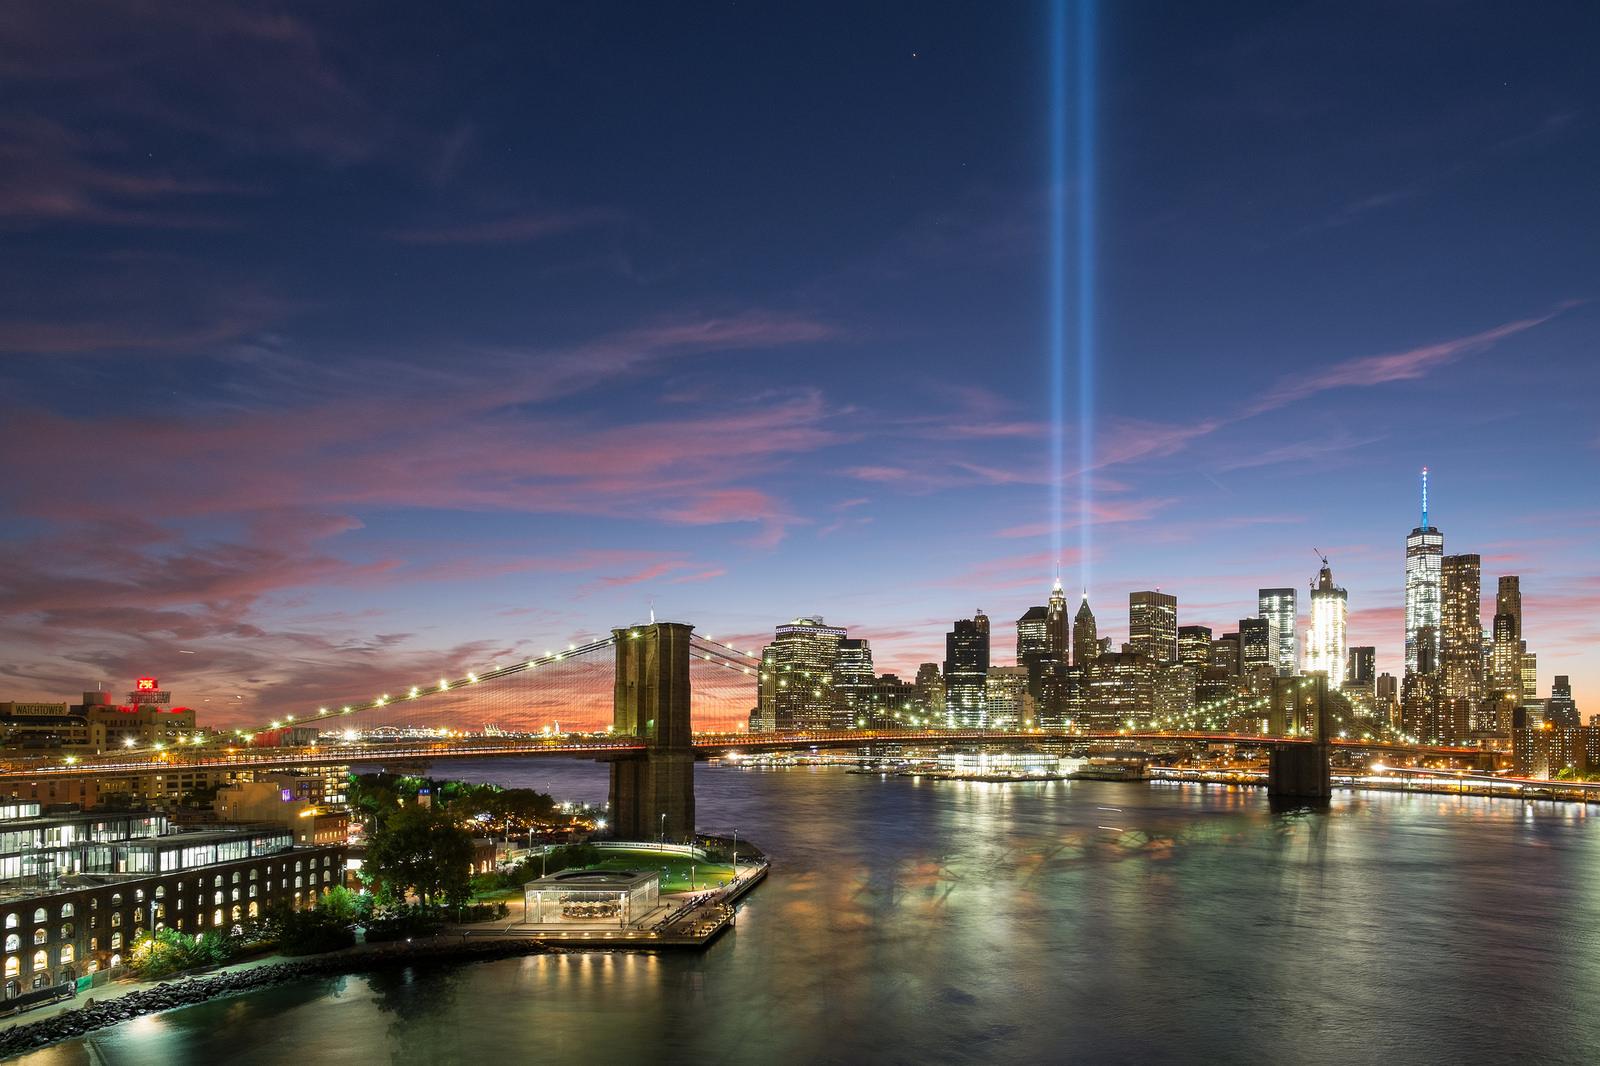 """Tribute in Light"" September 11, 2016. New York City  Fujifilm XPro1, 14mm, f/8, 10s, ISO 400"